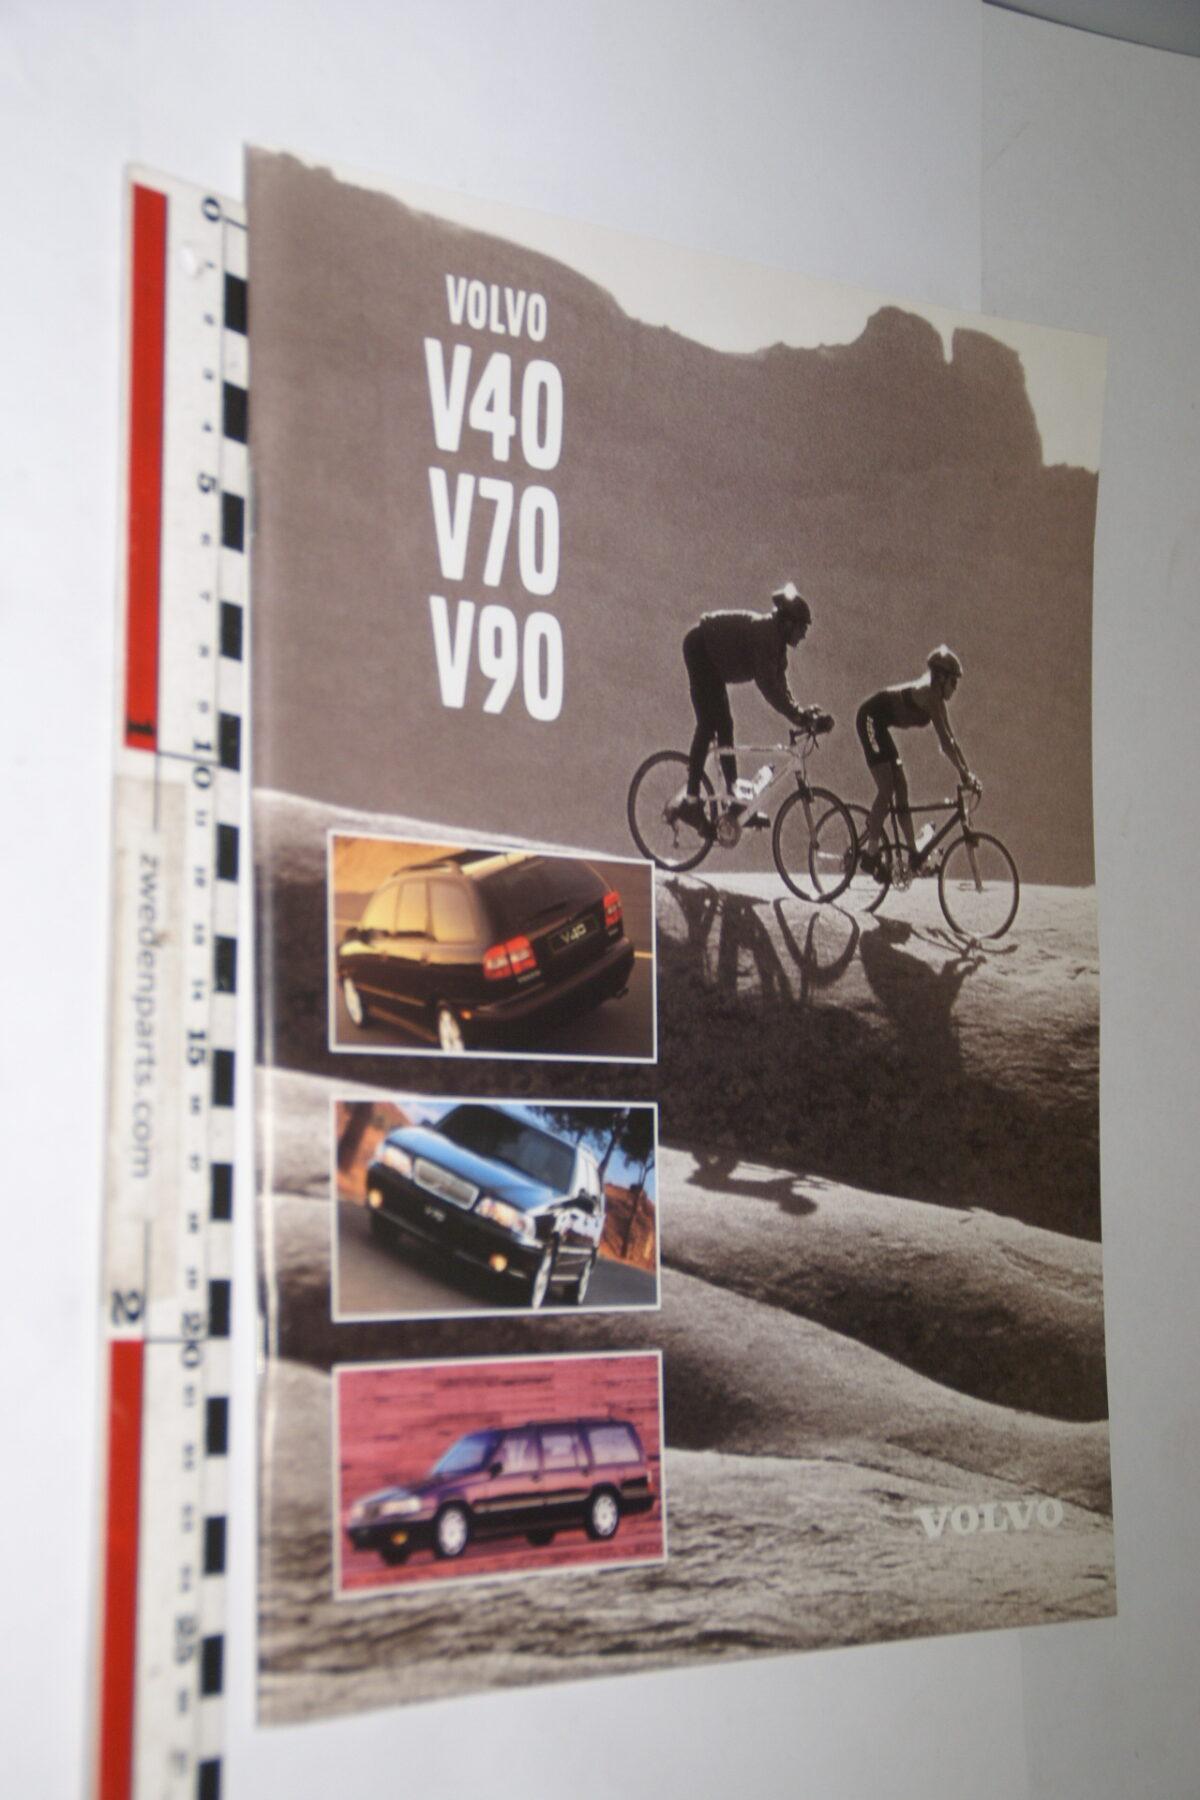 DSC04748 1997 originele brochure Volvo V40 V70 V90 nr C0897-a172aaf3